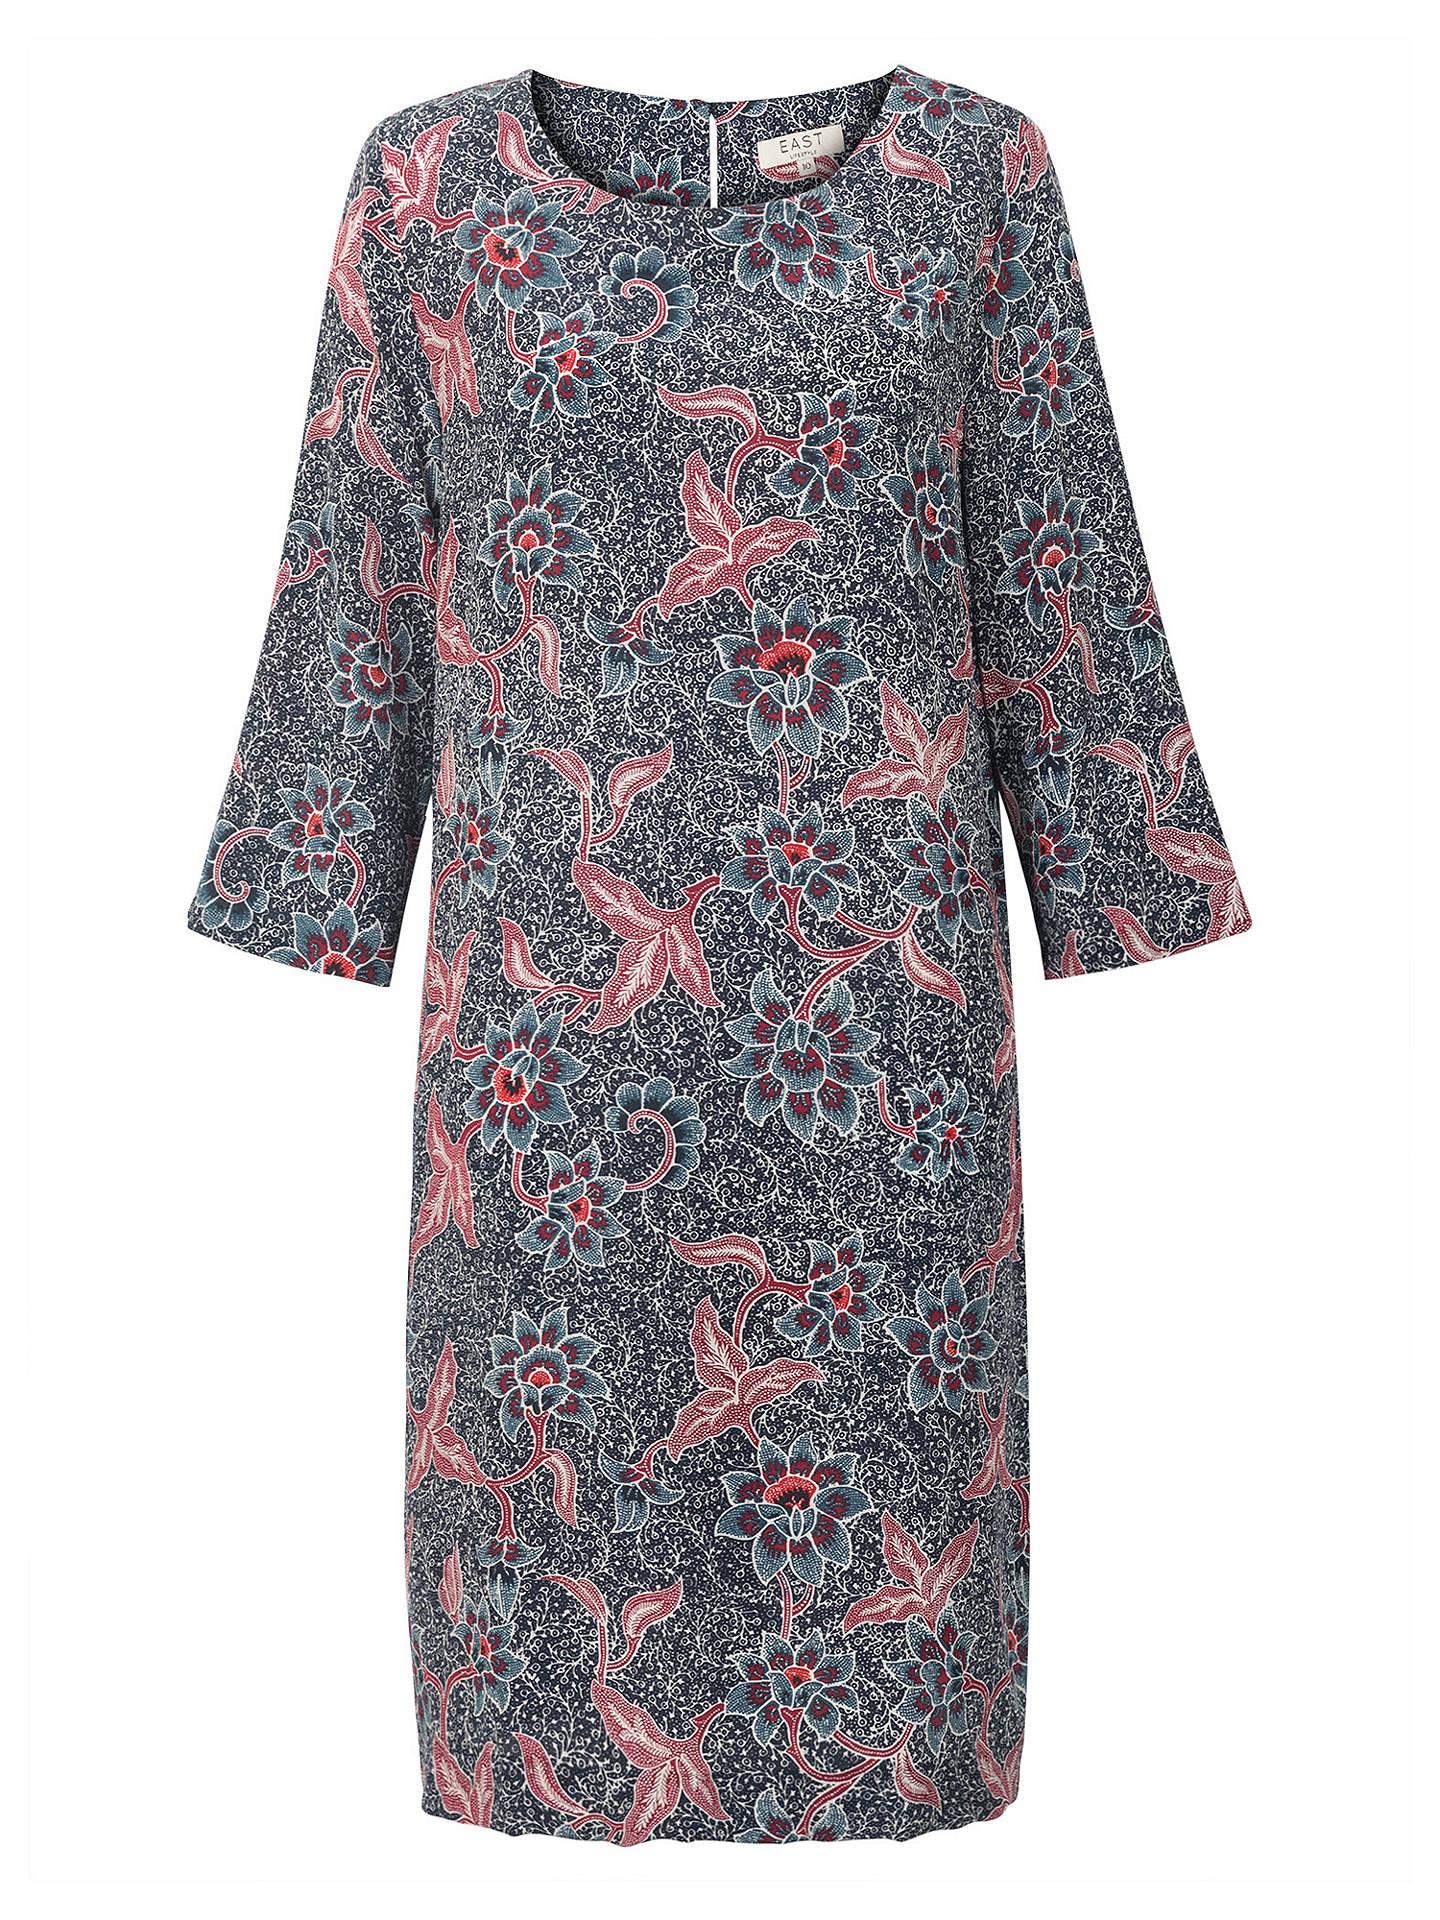 East Silk Bali Print Dress Indigo At John Lewis Partners